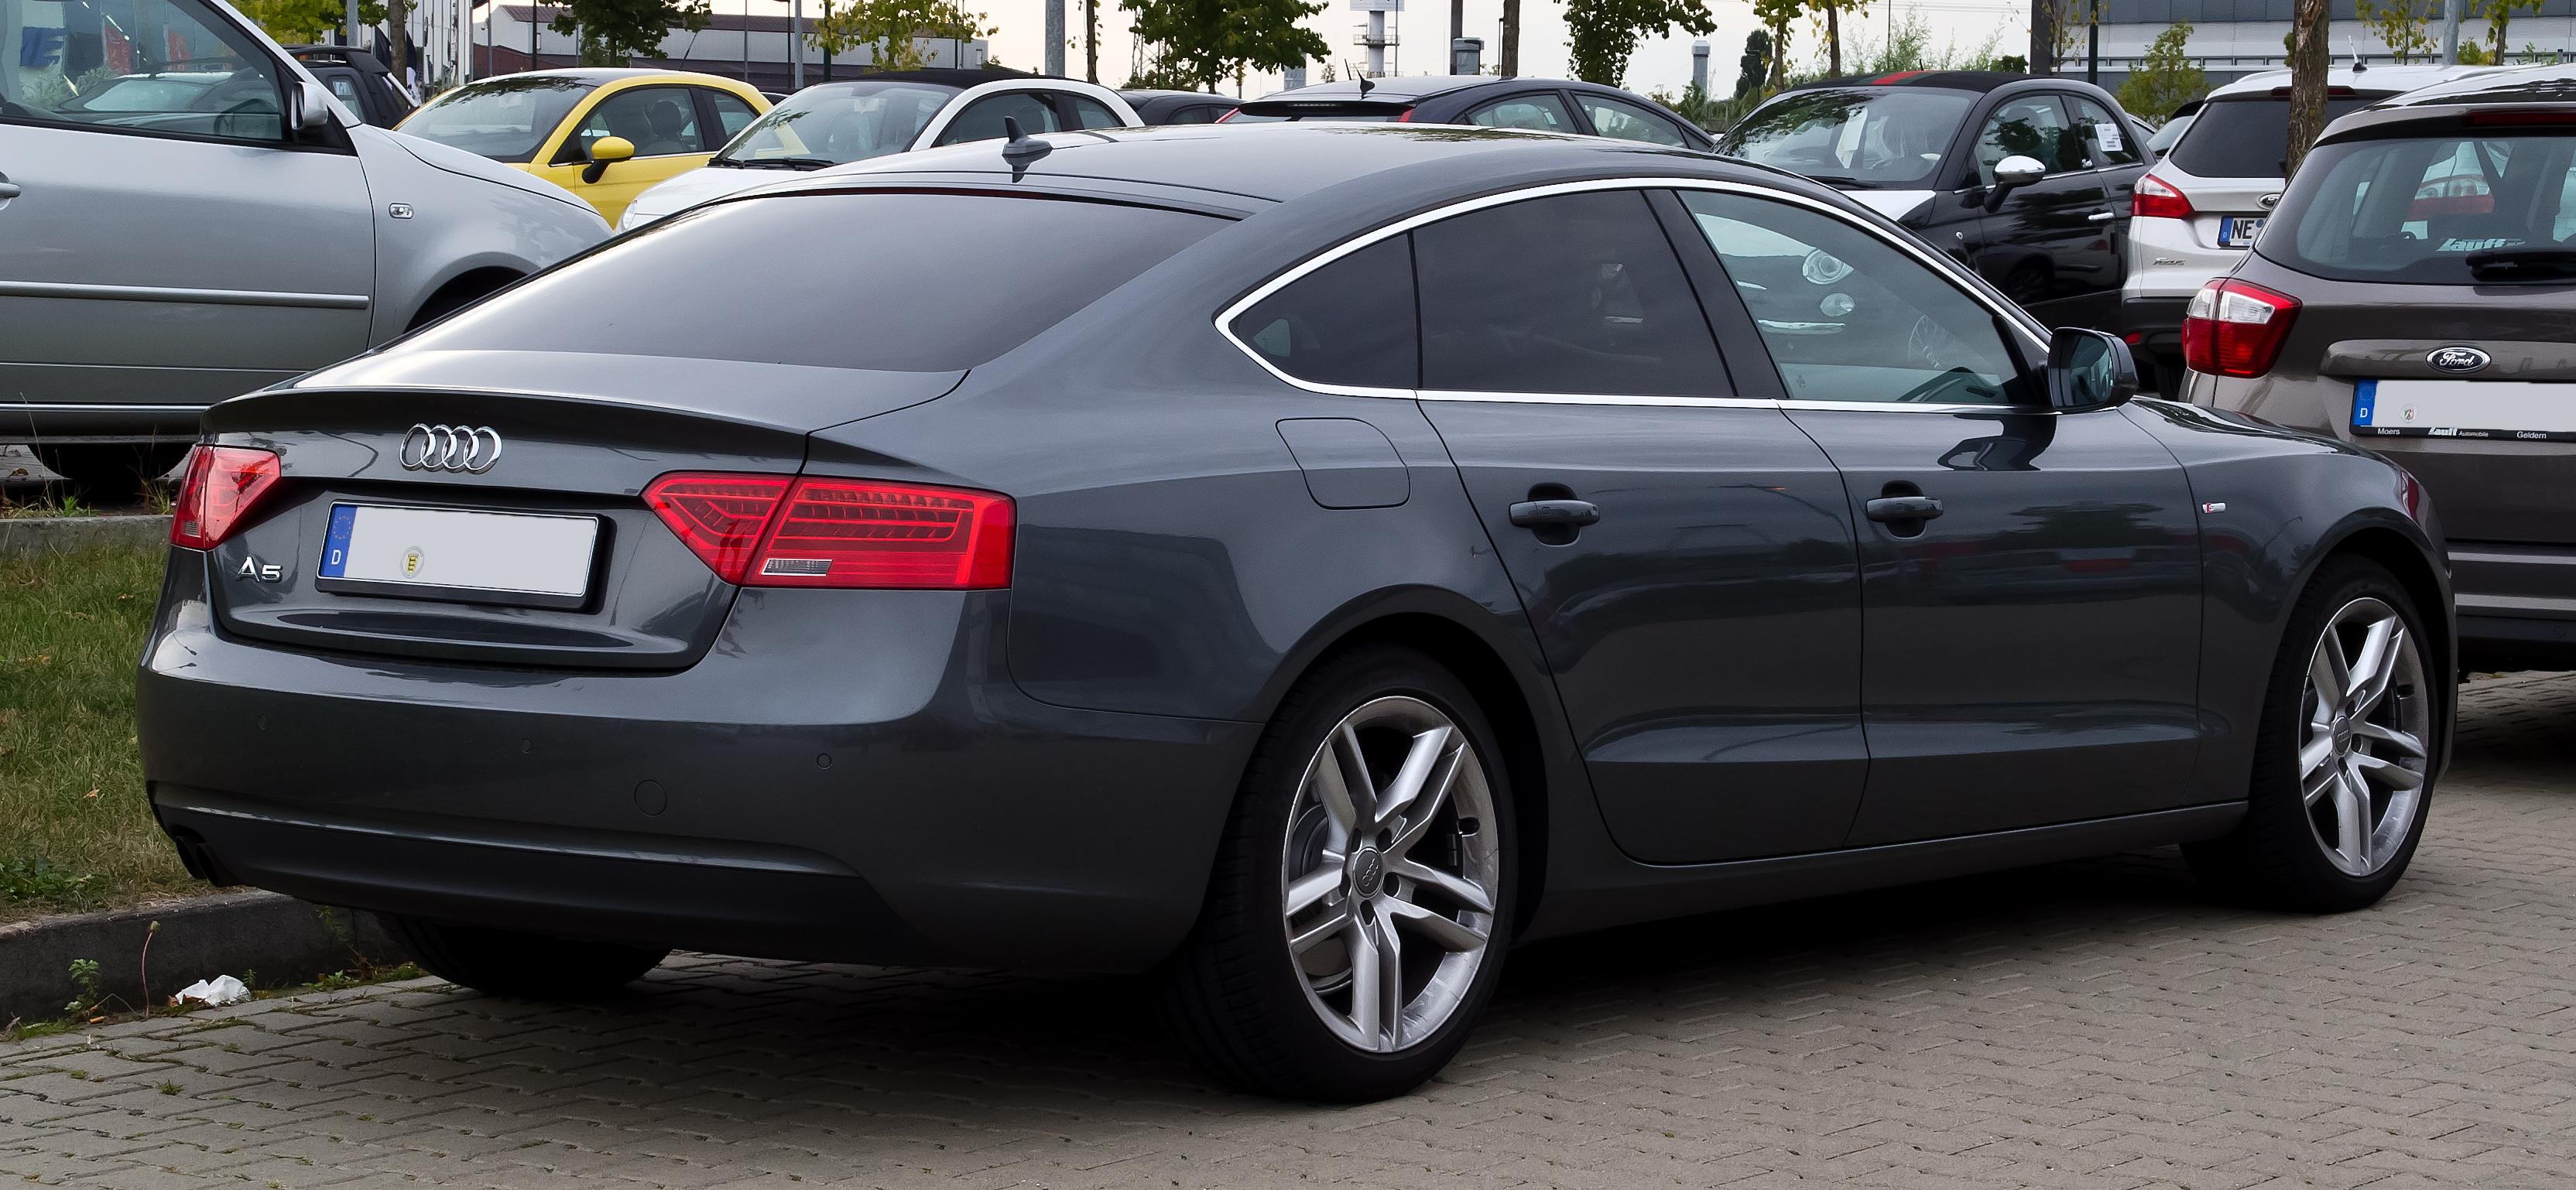 File Audi A5 Sportback 2 0 Tdi S Line Facelift